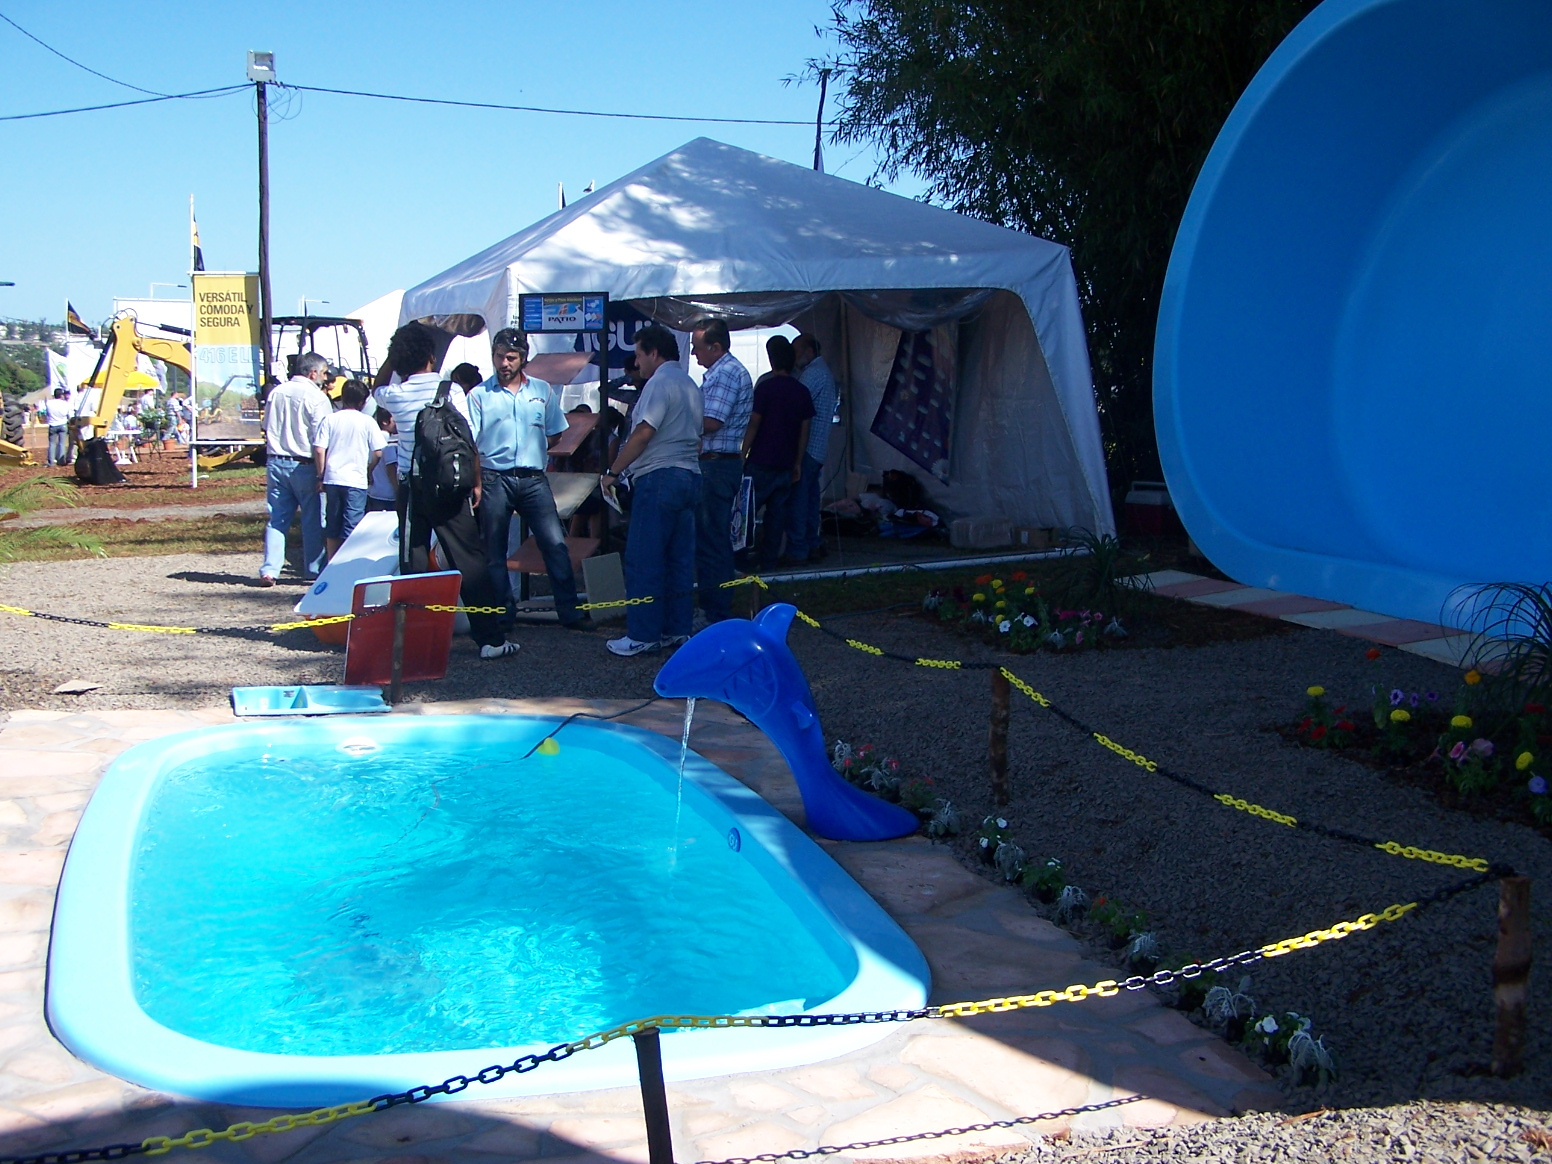 Cosas buscadas igui piletas de natacion natatorios for Costo construccion pileta